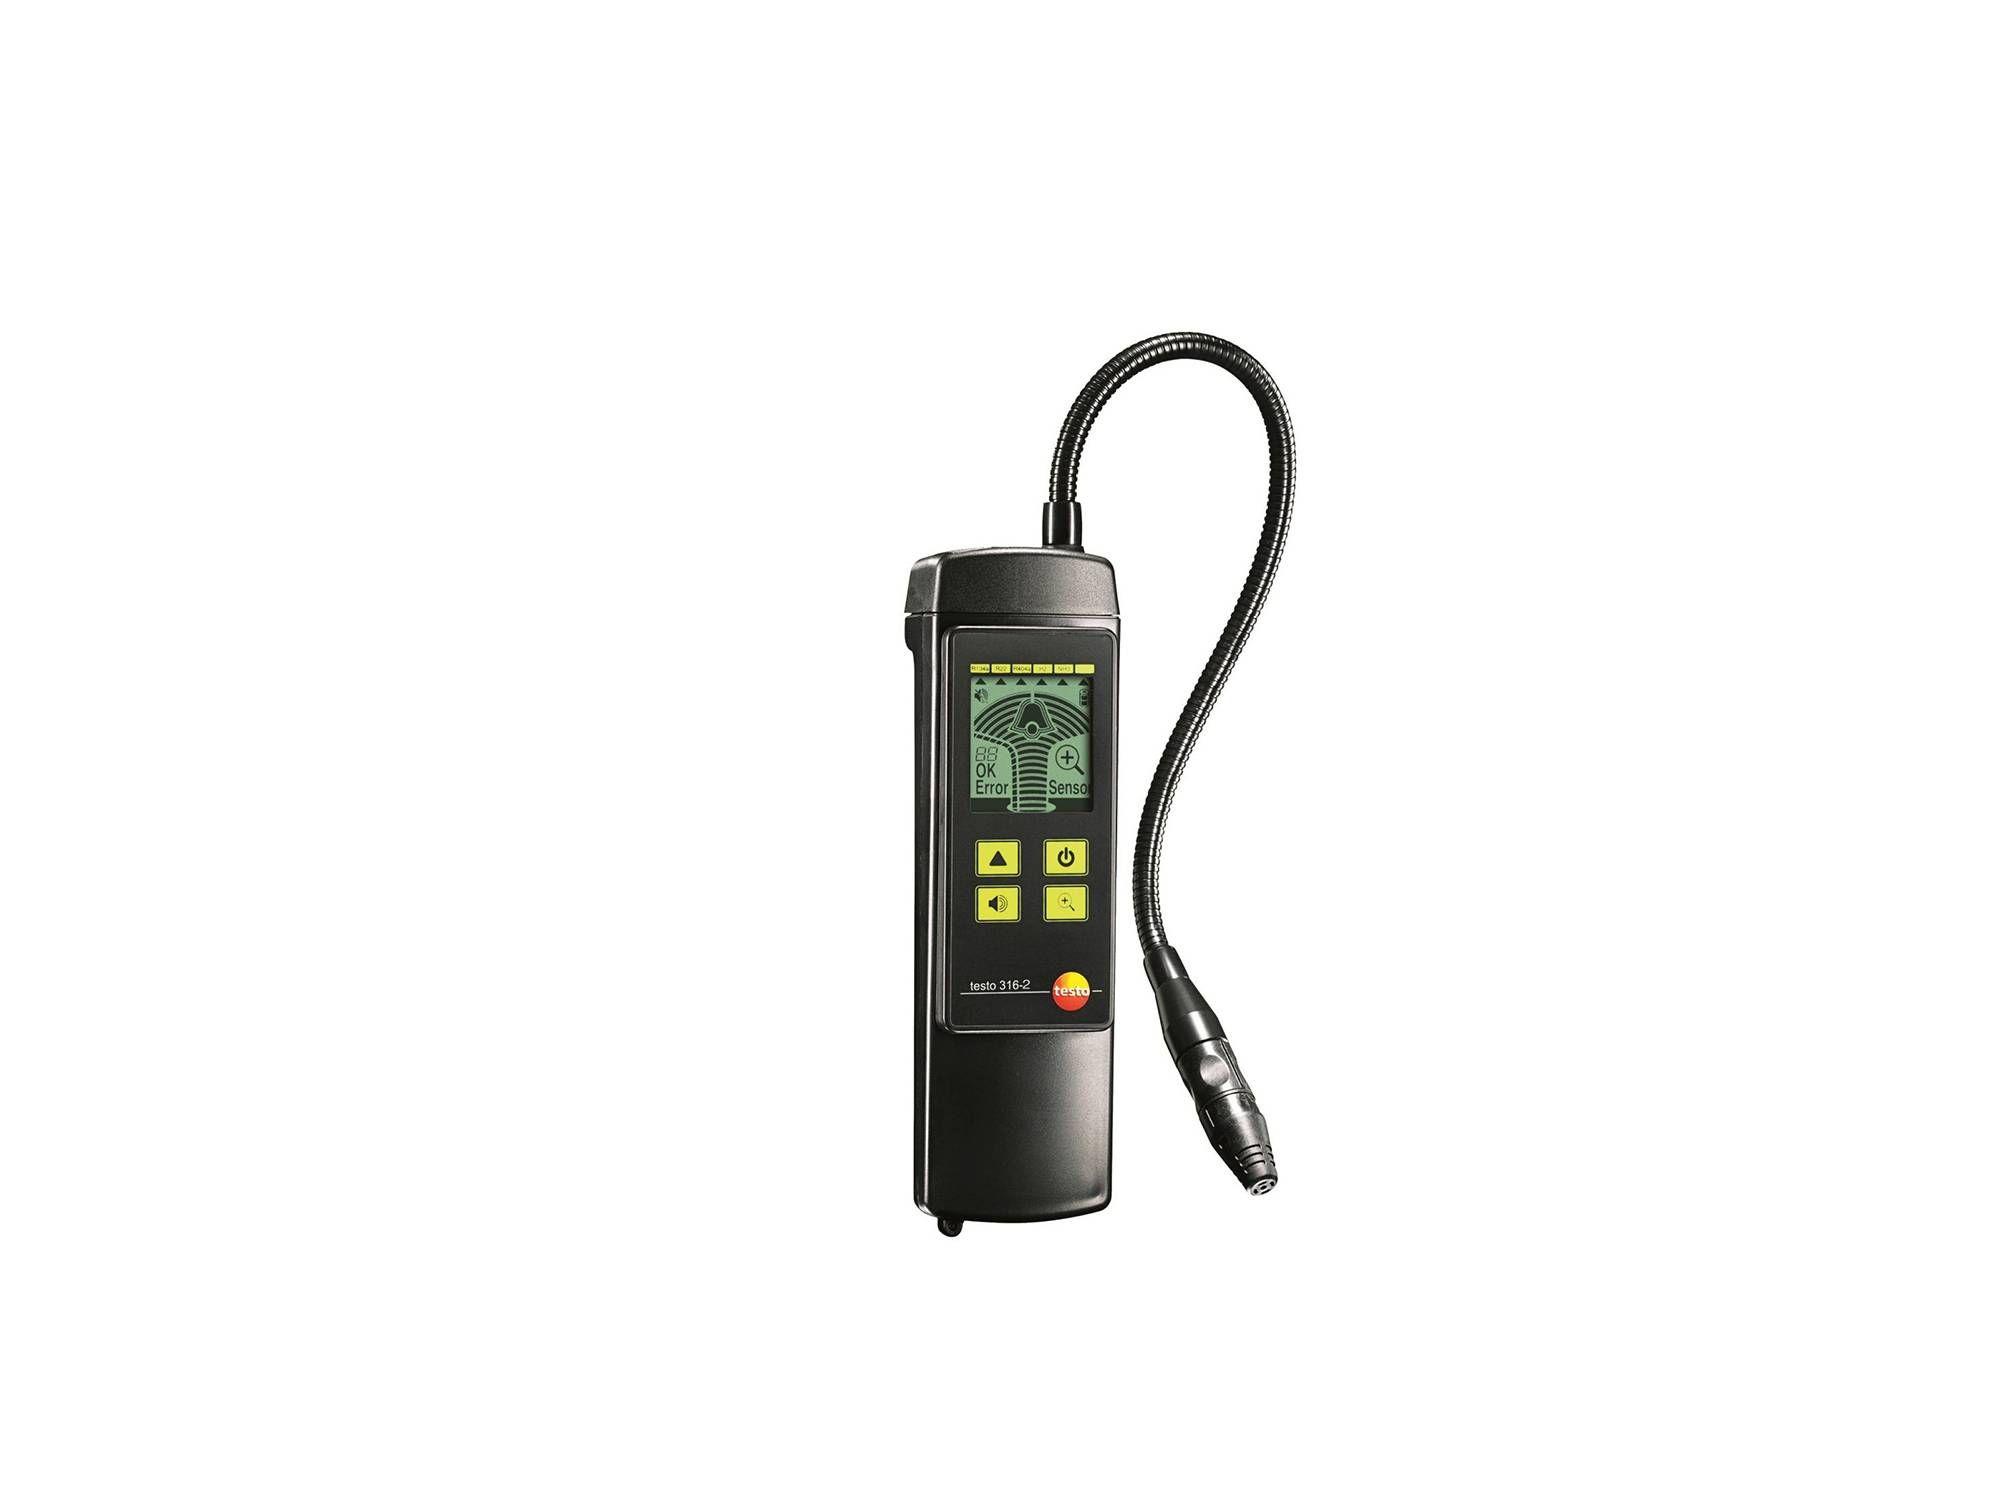 testo 316-2 可燃气体检漏仪